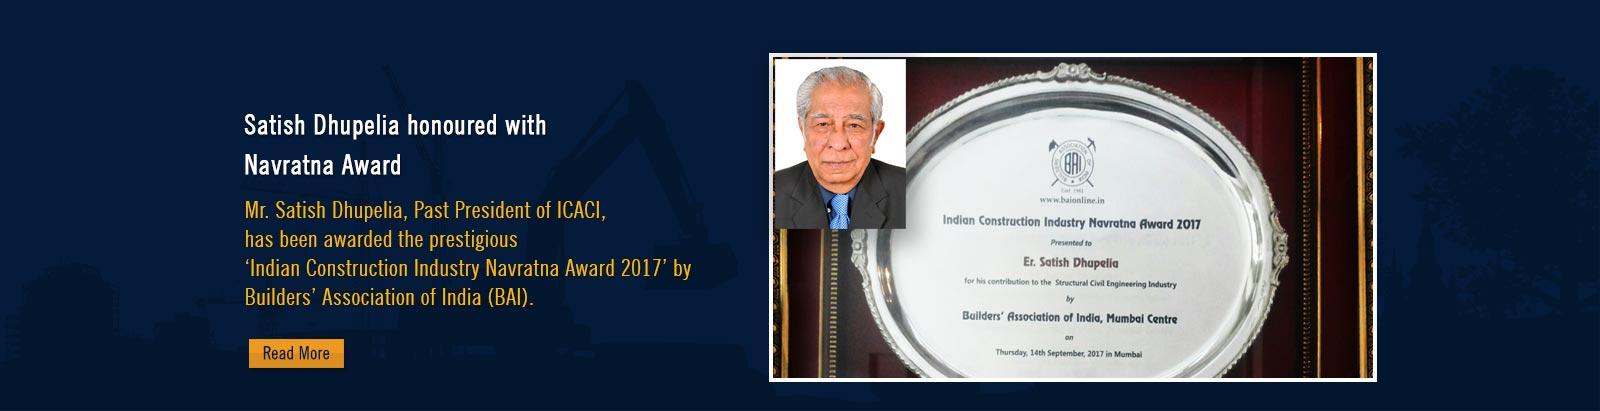 Satish-Dhupelia-award-slide